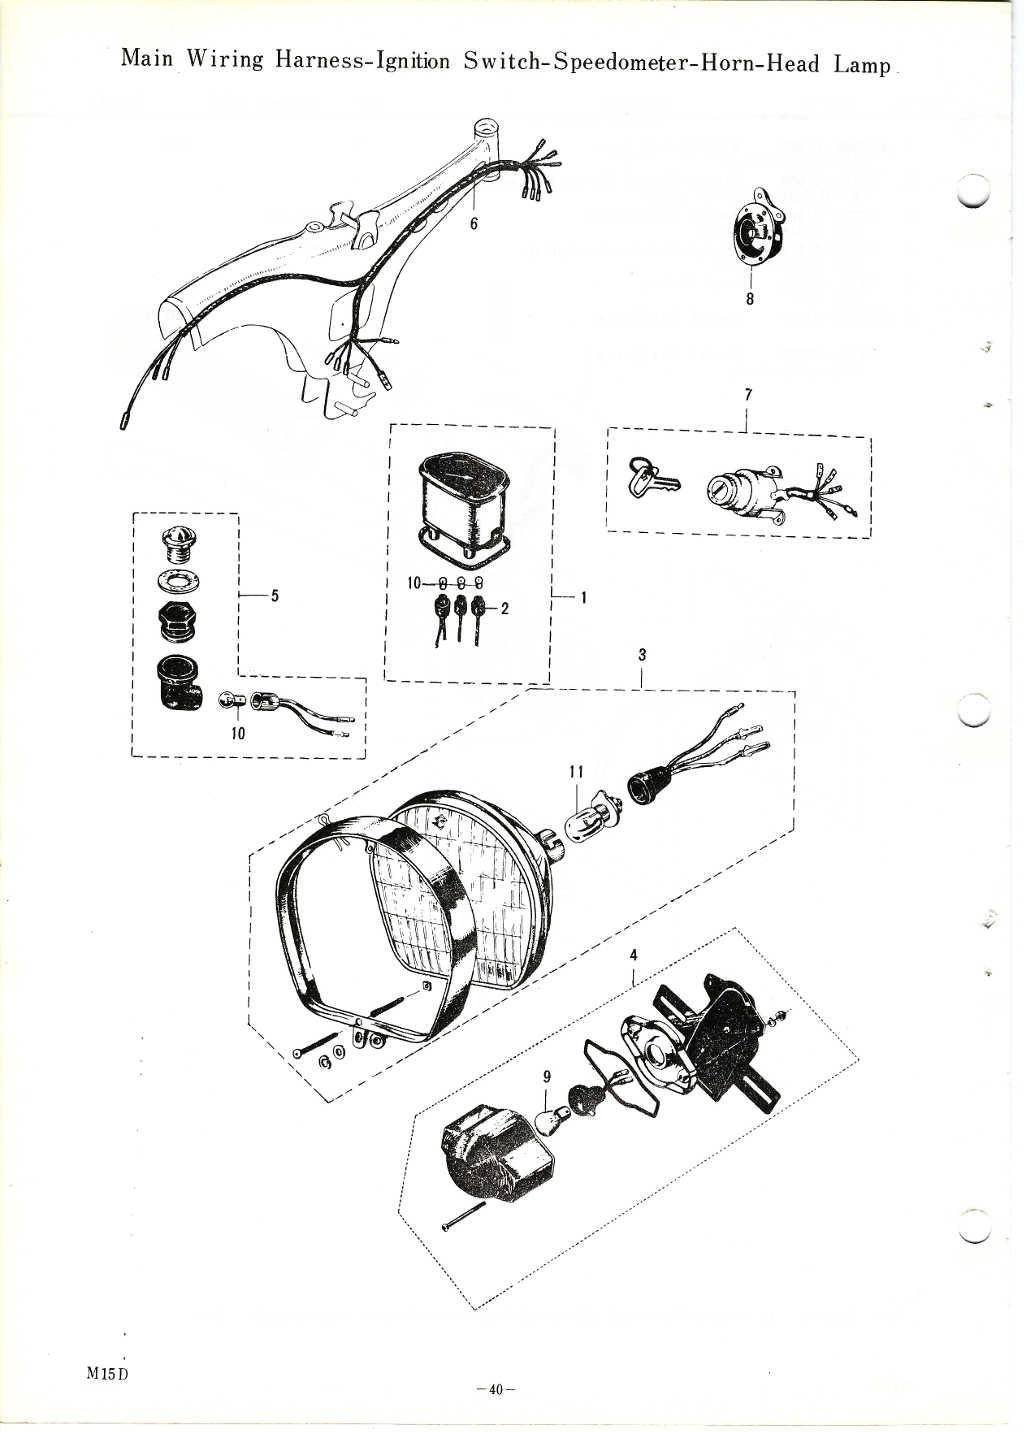 m15 m15d m12 parts manualMain Wiring Harnessignition Switchspeedometerhornhead Lamp Diagram #8